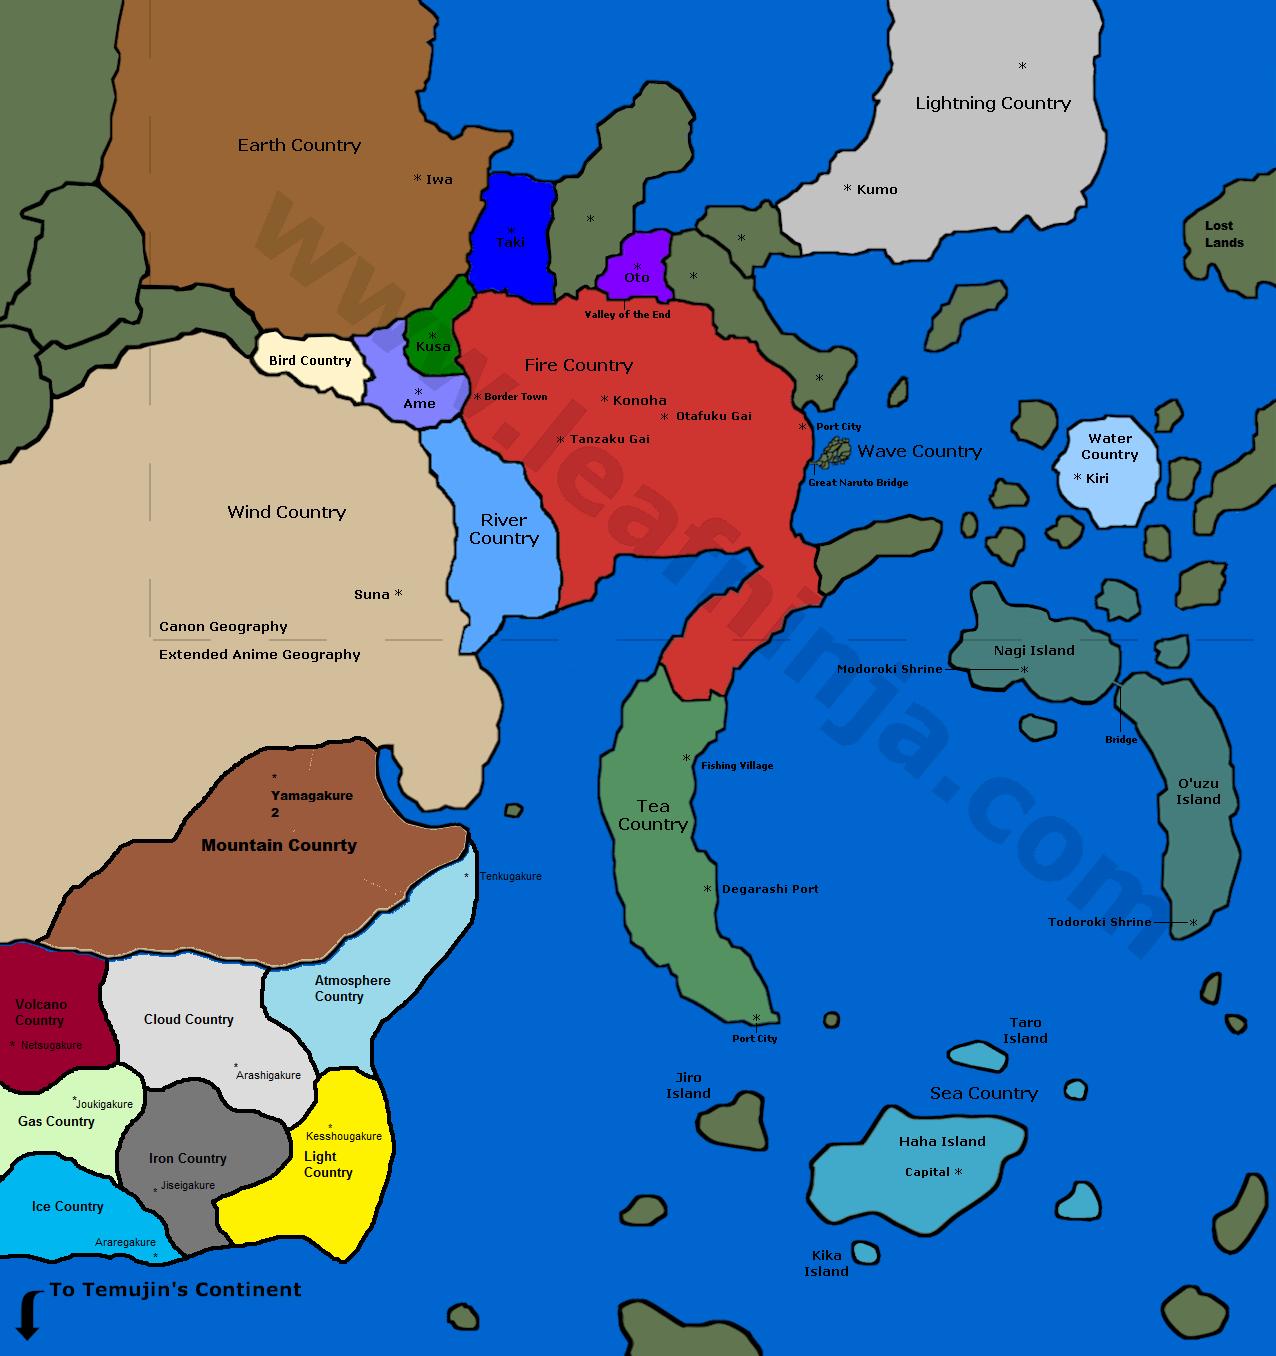 Image world map version 4g dragon ball af fanon wiki fandom world map version 4g gumiabroncs Images